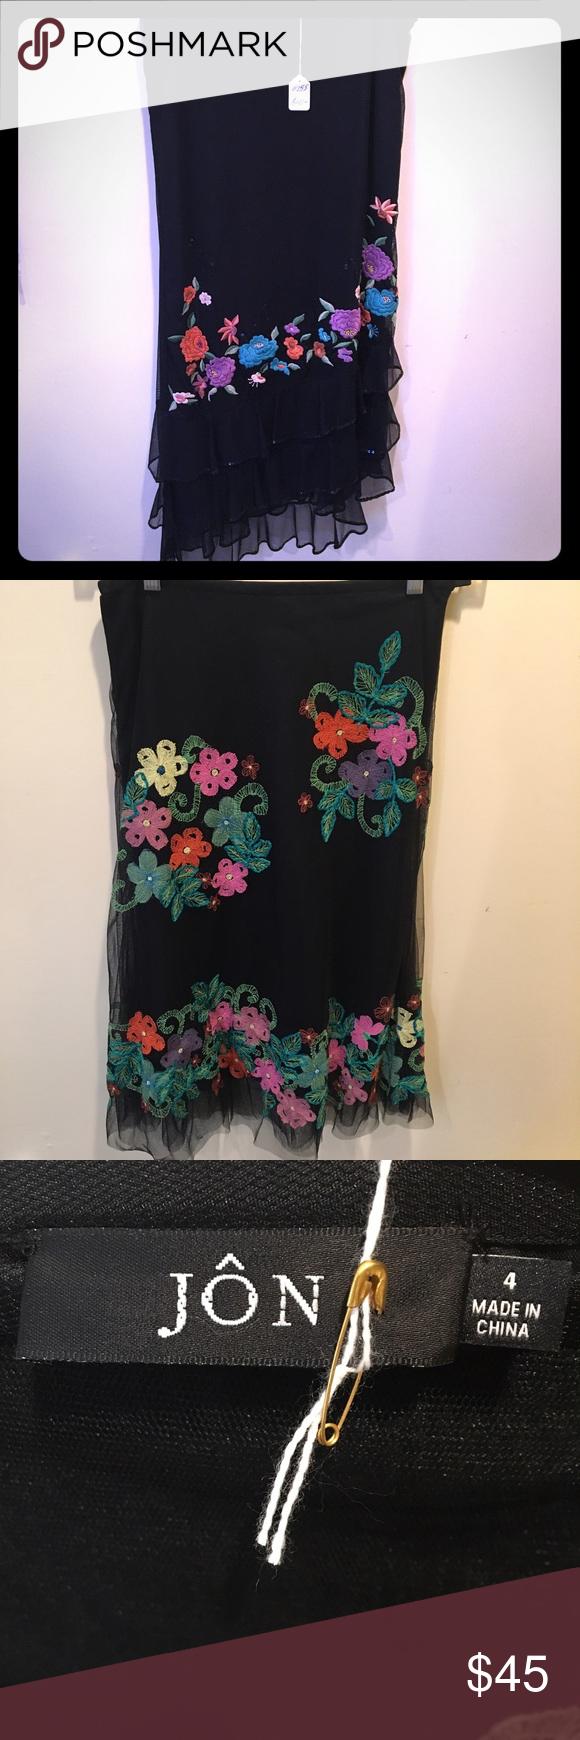 "Jon Embroidered Floral Trimmed Skirt Exclusive Wholesale Designer Jon Embroidered Floral Trimmed Skirt | flow Mid Length | size: 4 | 27"" waist | 36-37"" waist jon Skirts Midi"